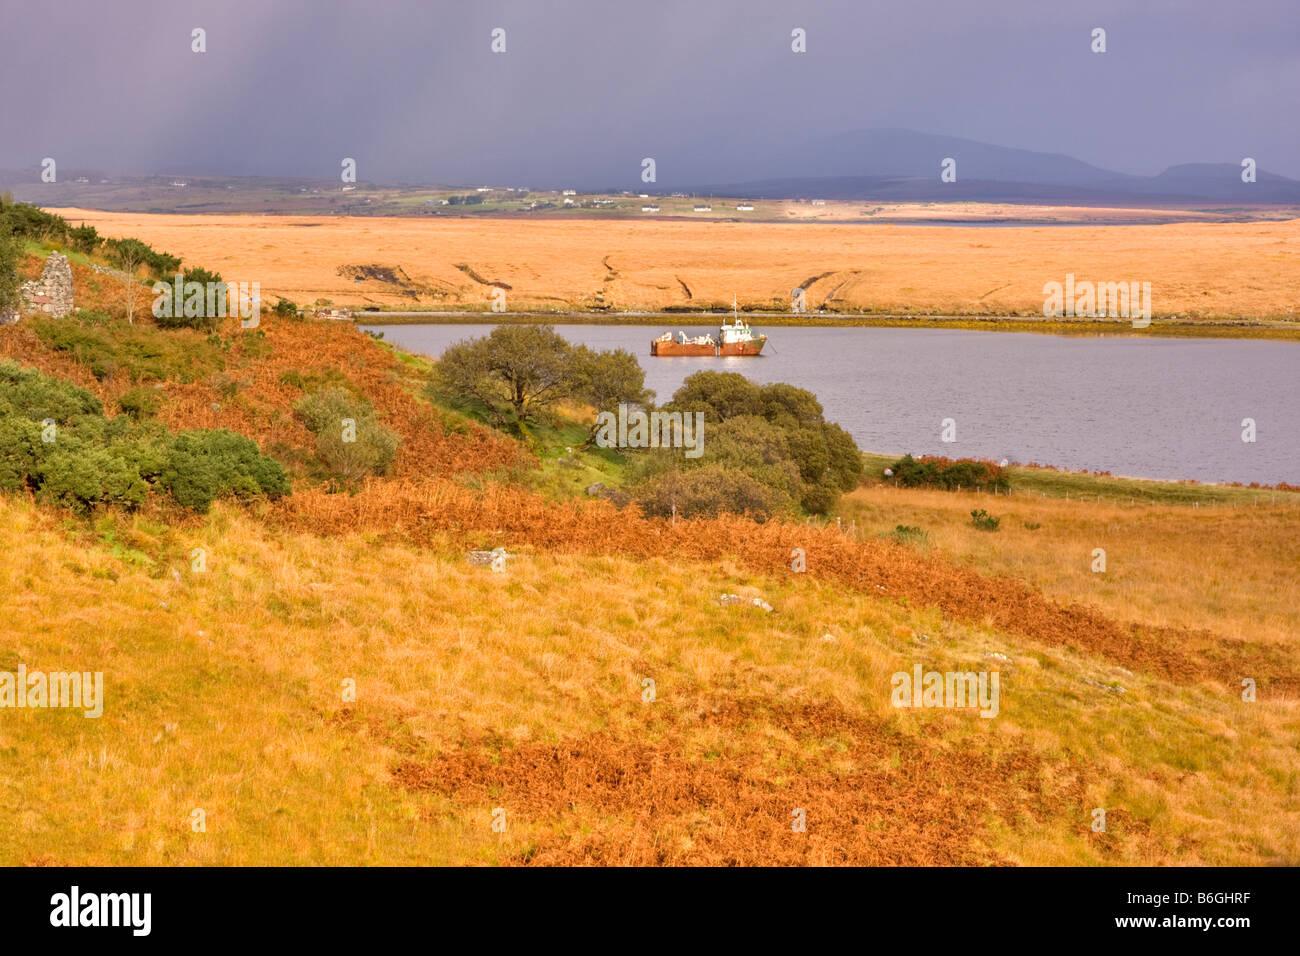 Corraun Peninsula, County Mayo, Ireland - Stock Image